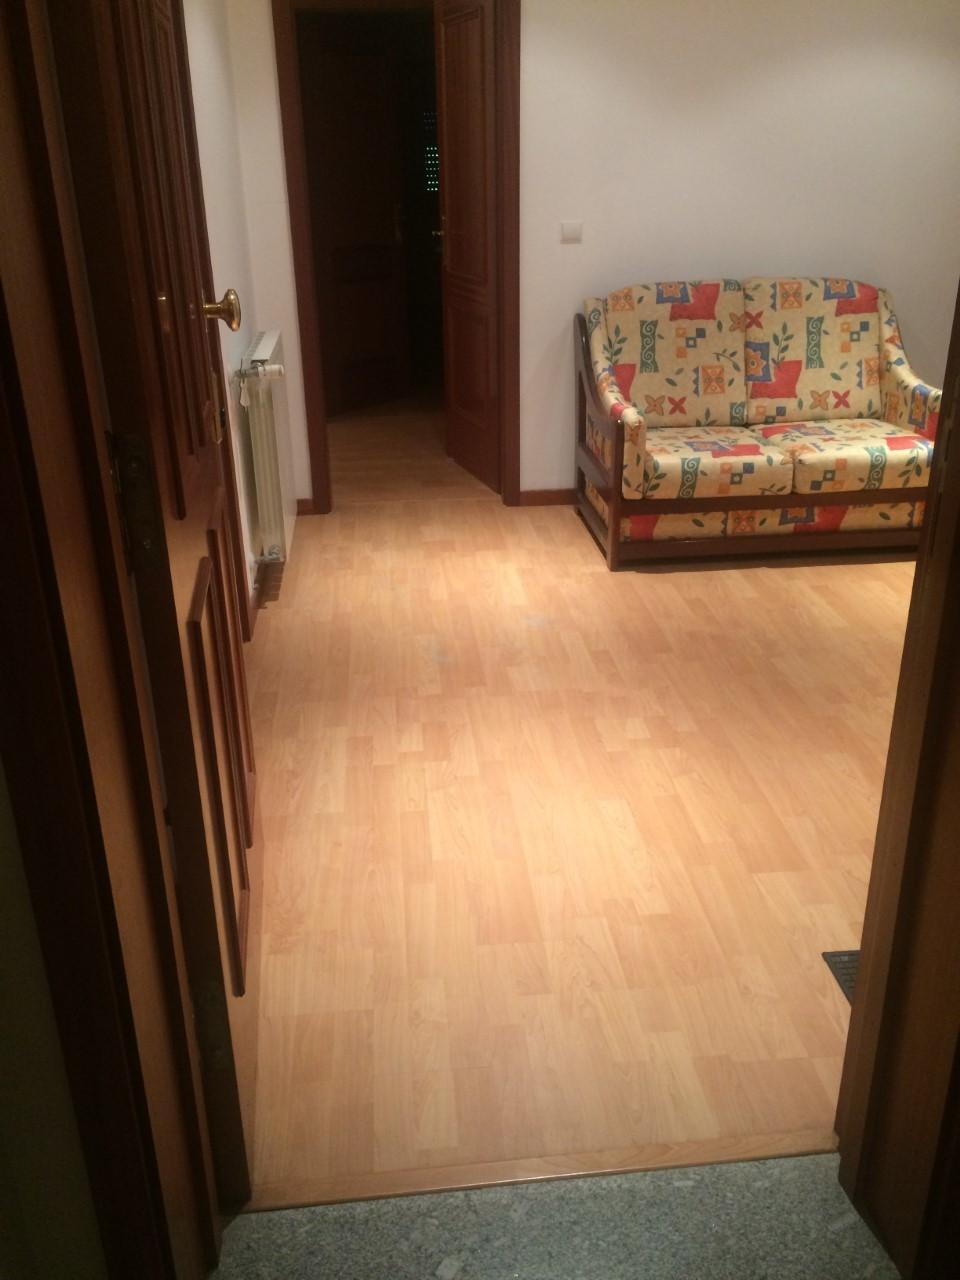 rent-room-covilha-7144b47b8e68687f37ef0caa5245aeb8